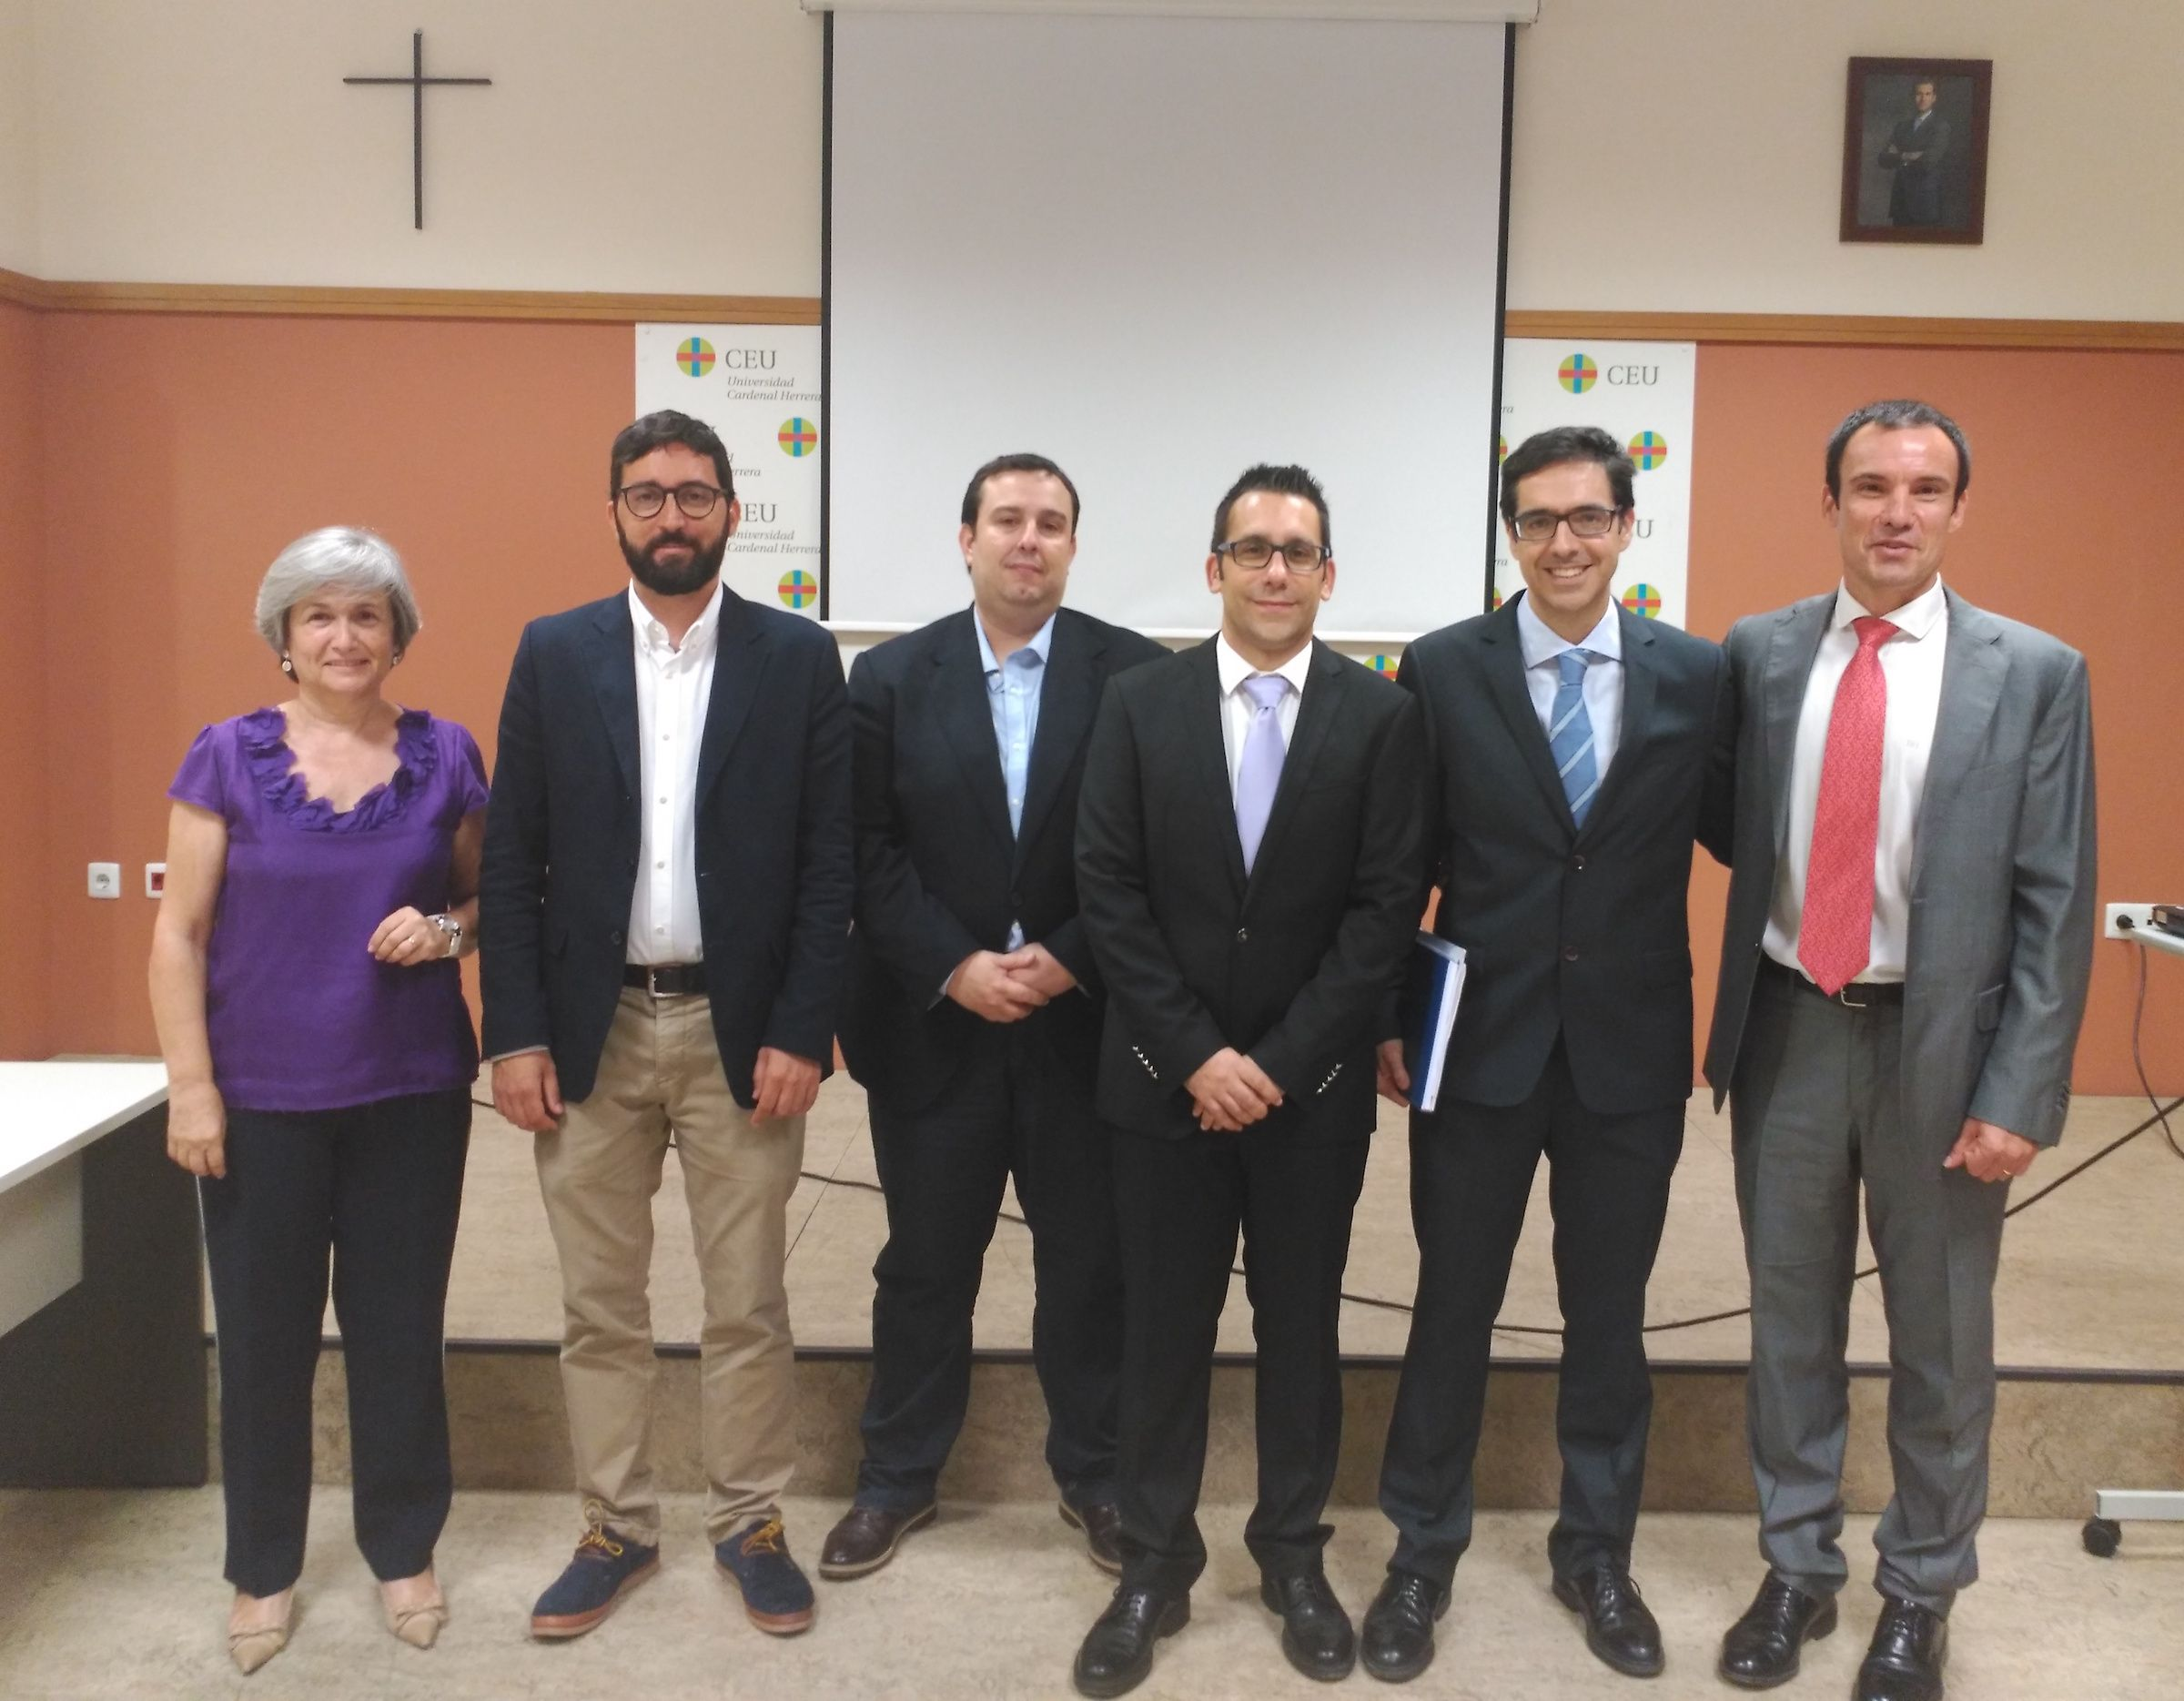 De izquierda a derecha, los investigadores Empar Lurbe (HGV), Ausiás Cebolla (UV), Jaime Guixeres (UPV), Alejandro Brunó (CEU-UCH), Julio Álvarez-Pitti (HGV) y Juan Francisco Lisón (CEU-UCH).